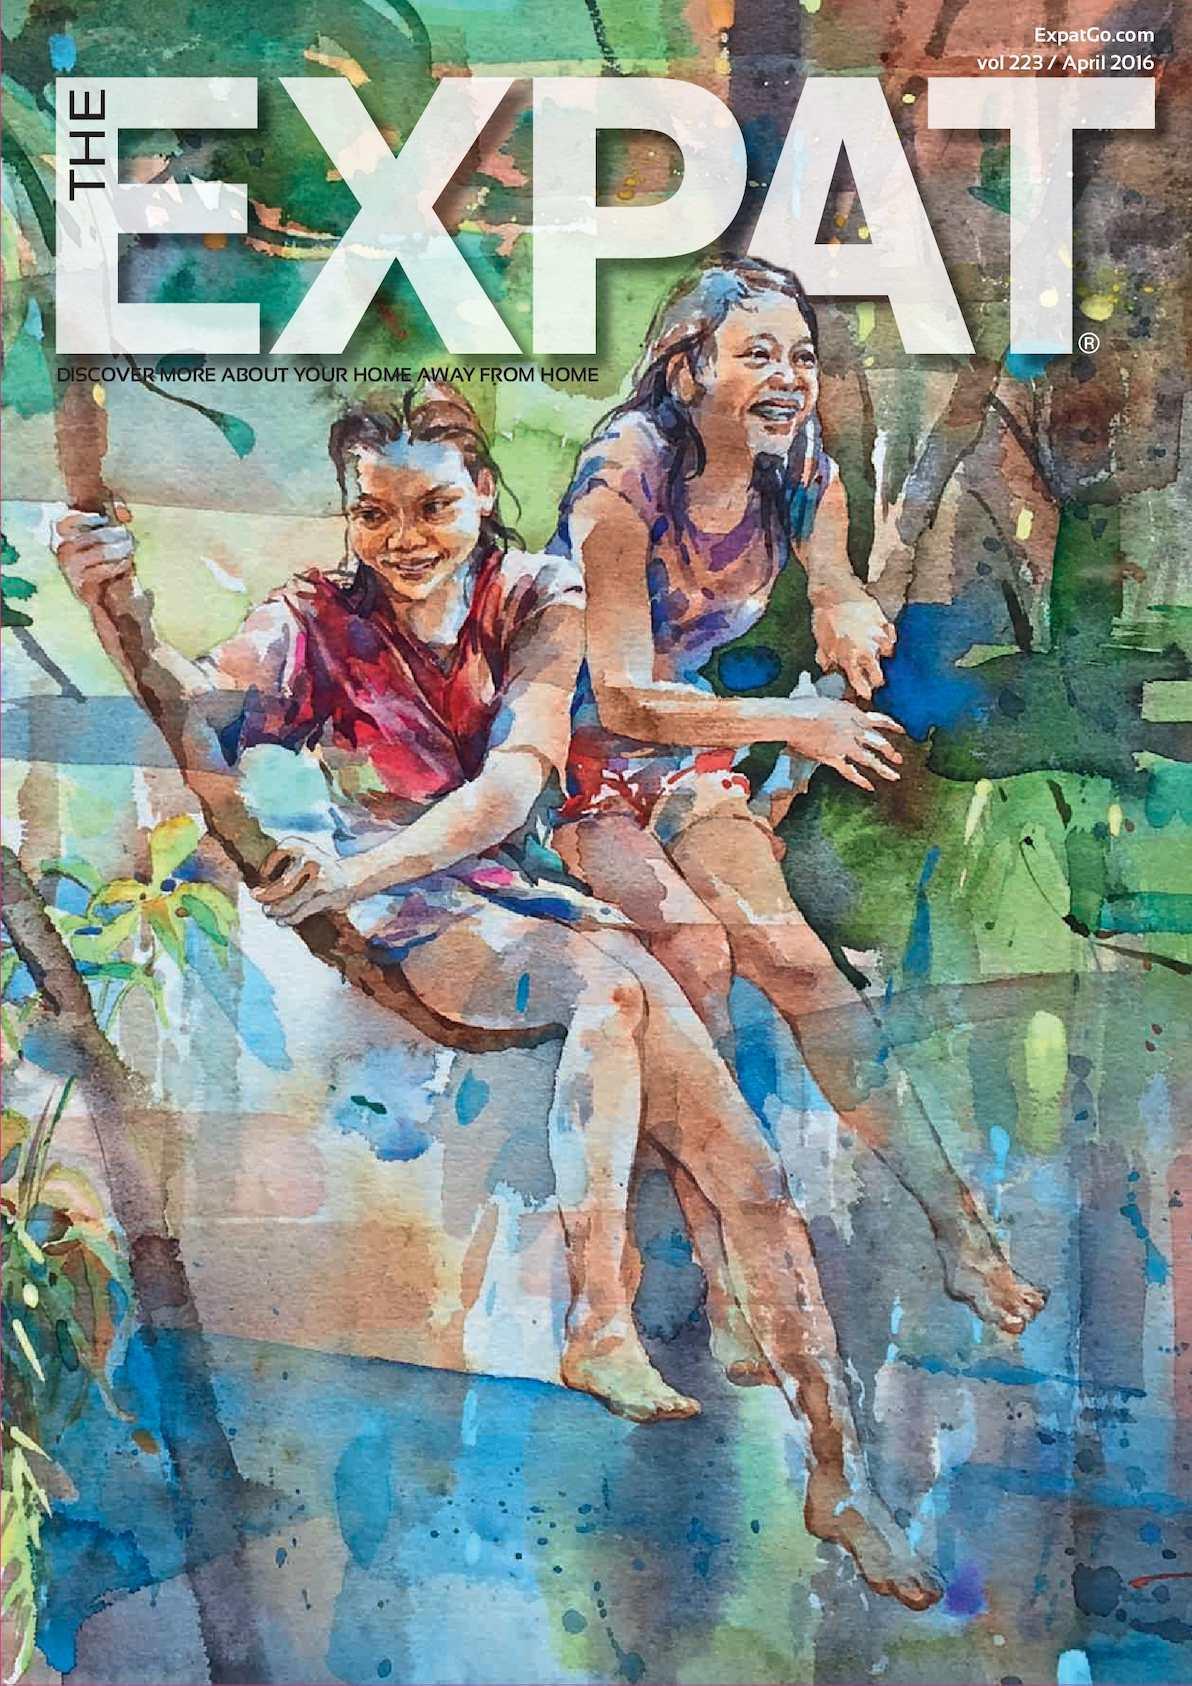 The Expat April 2016